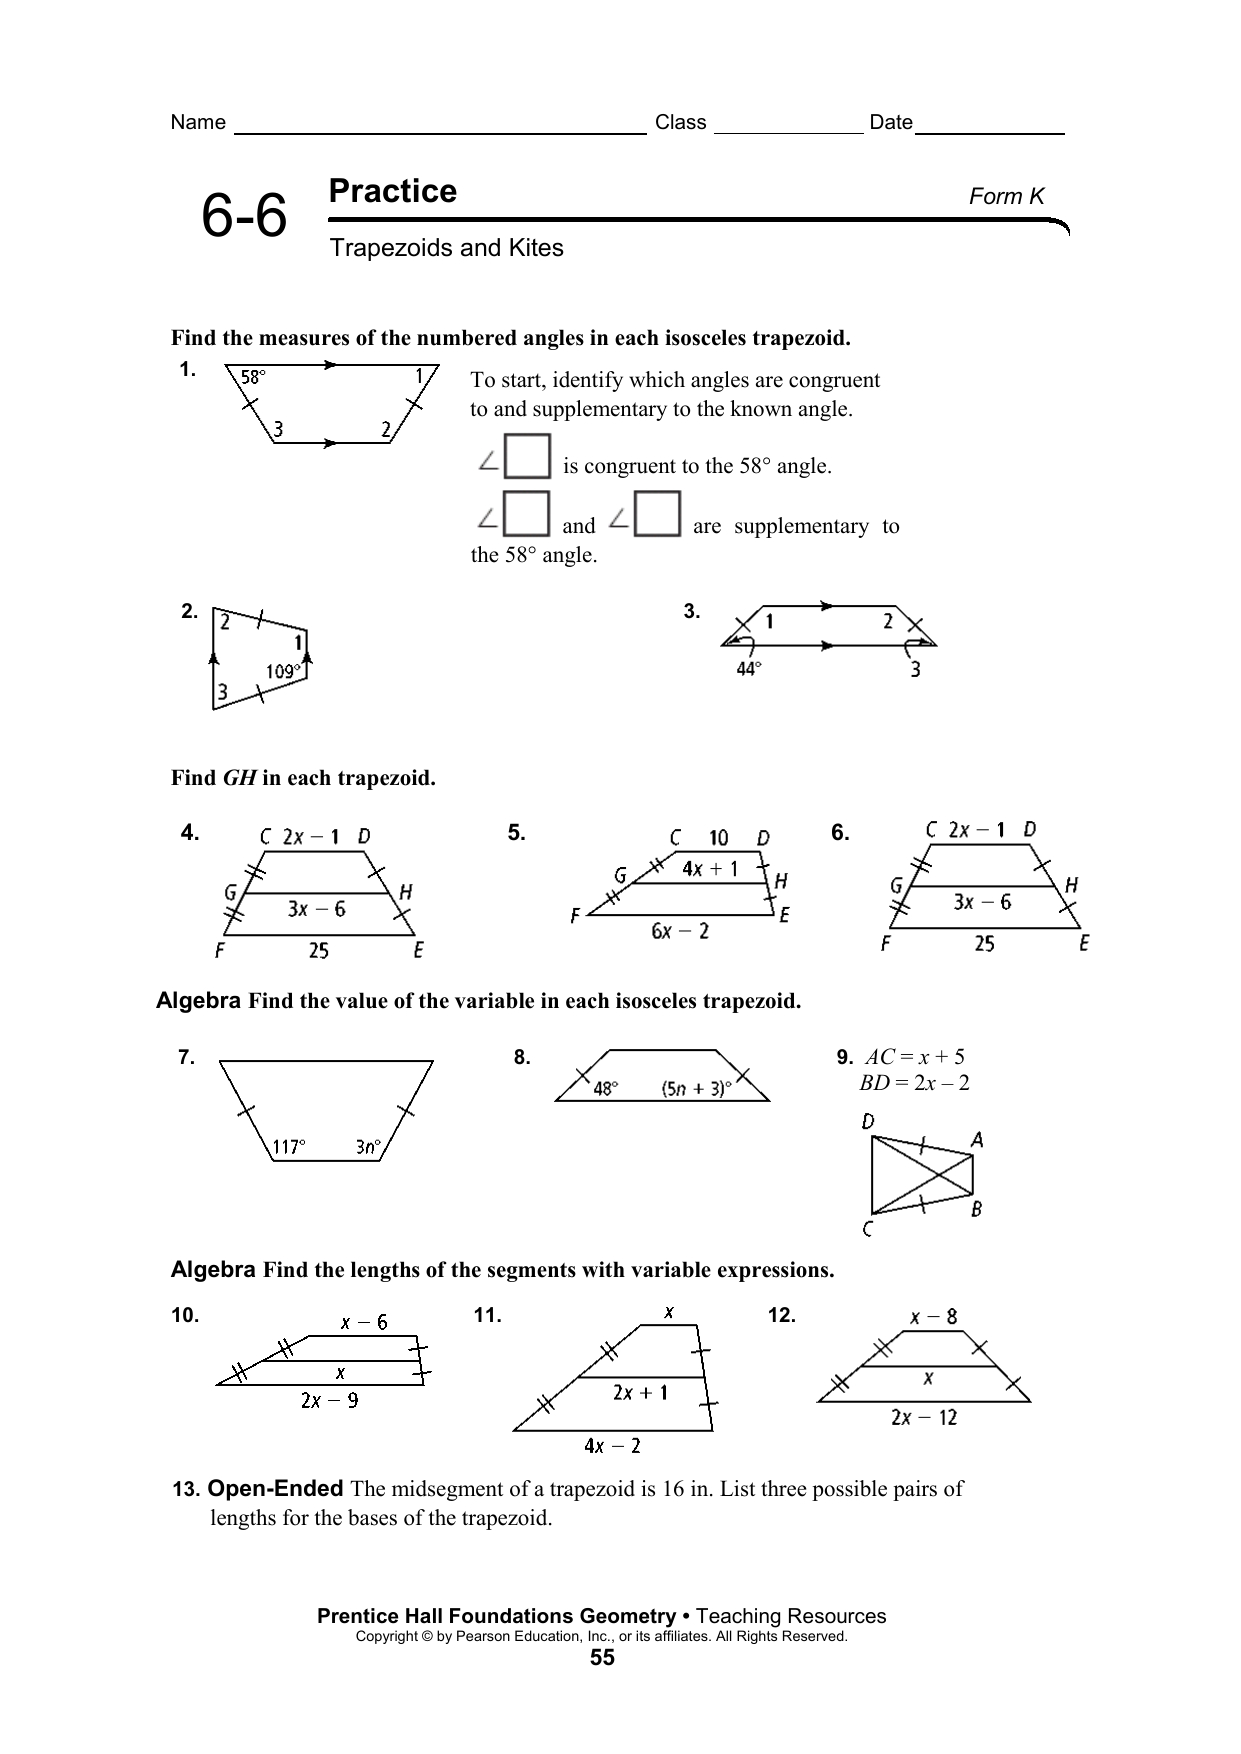 Geometry Worksheet Kites And Trapezoids Answers Key — db ...